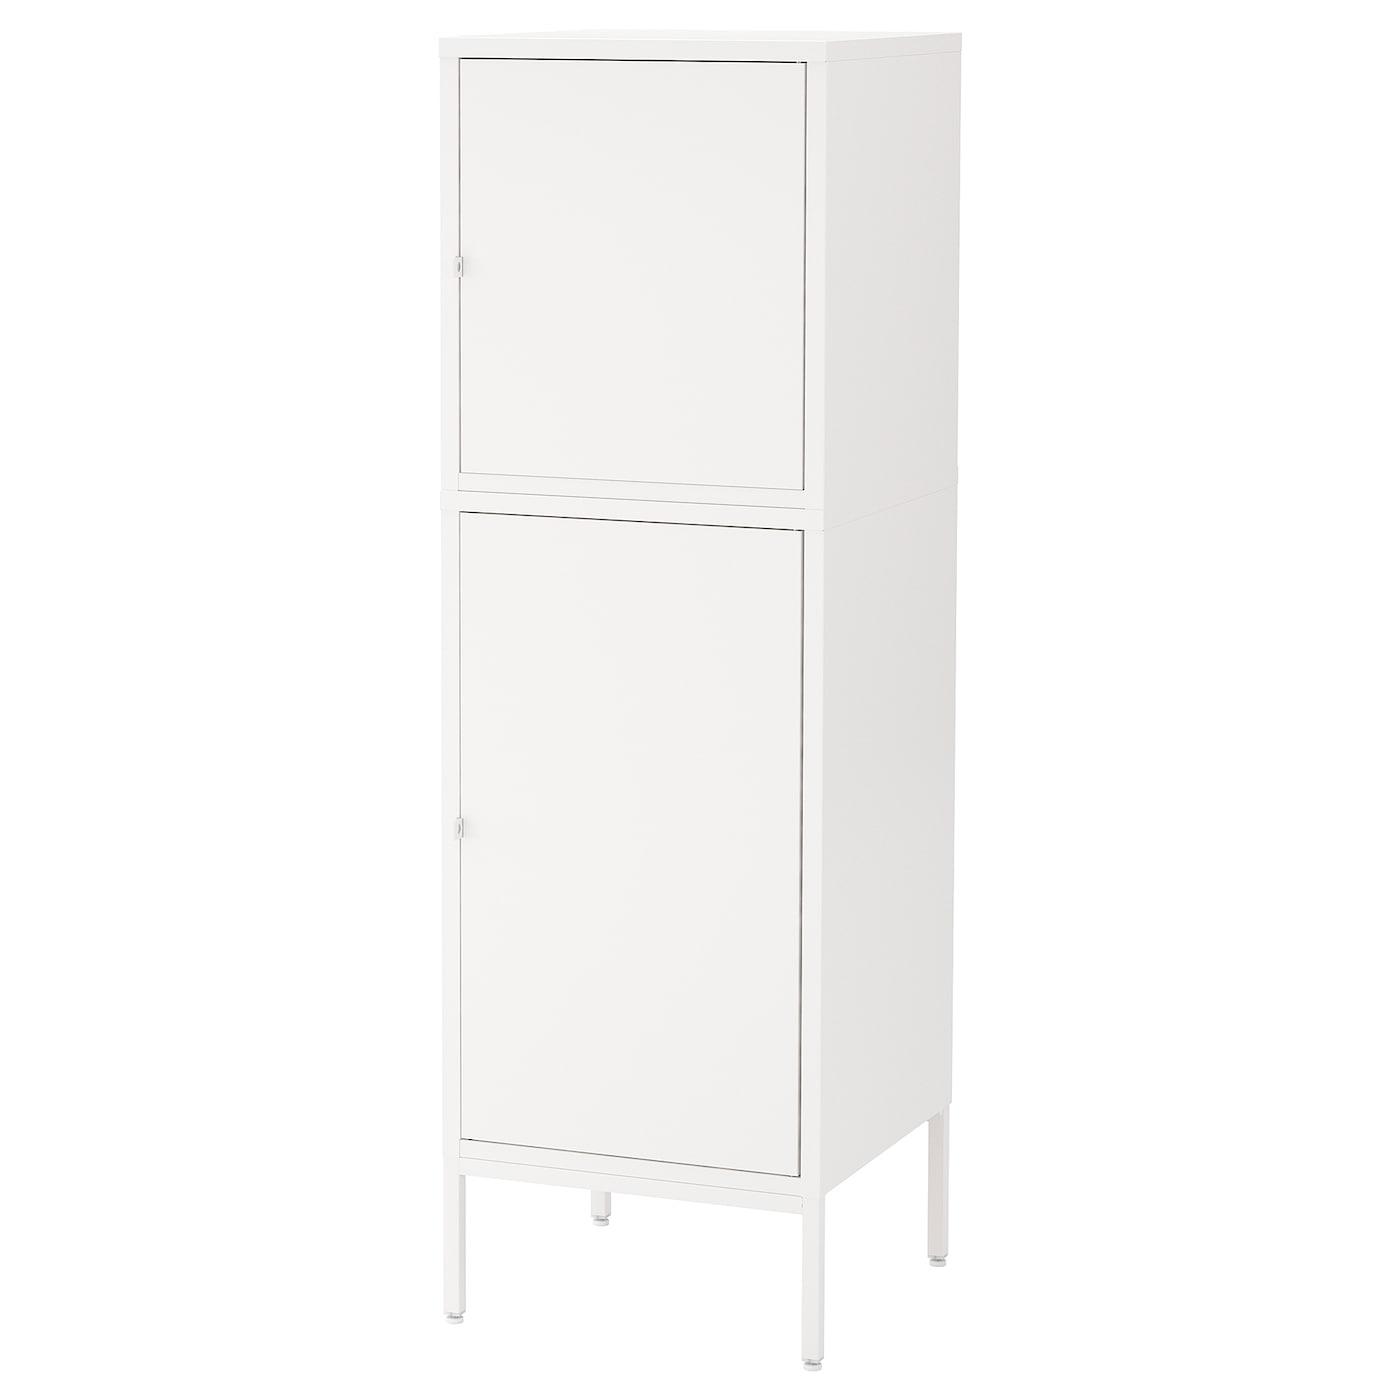 H llan mueble de sal n con almacenaje blanco 45 x 47 x 142 for Muebles almacenaje ikea